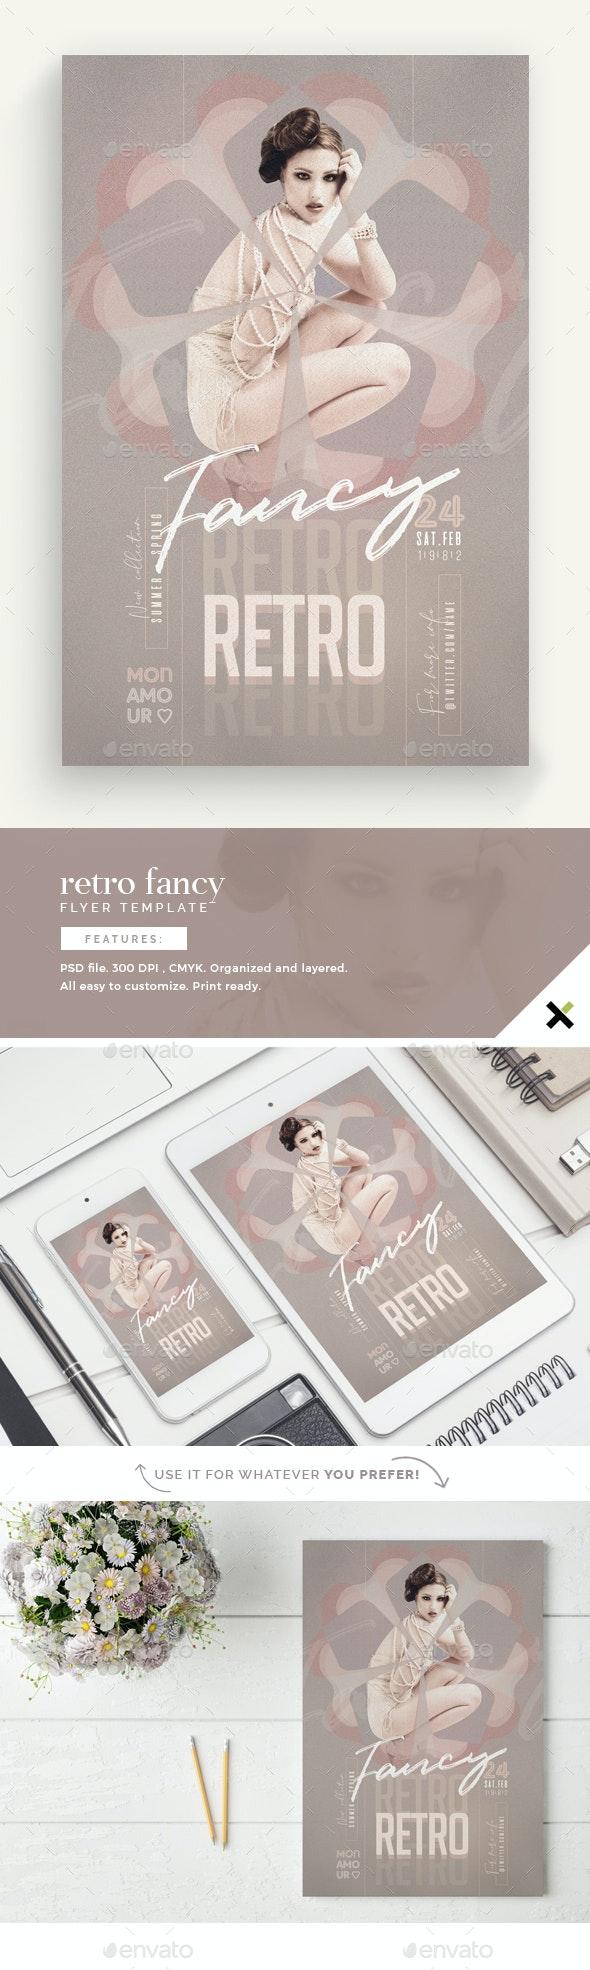 Retro Fancy Flyer Template - Flyers Print Templates